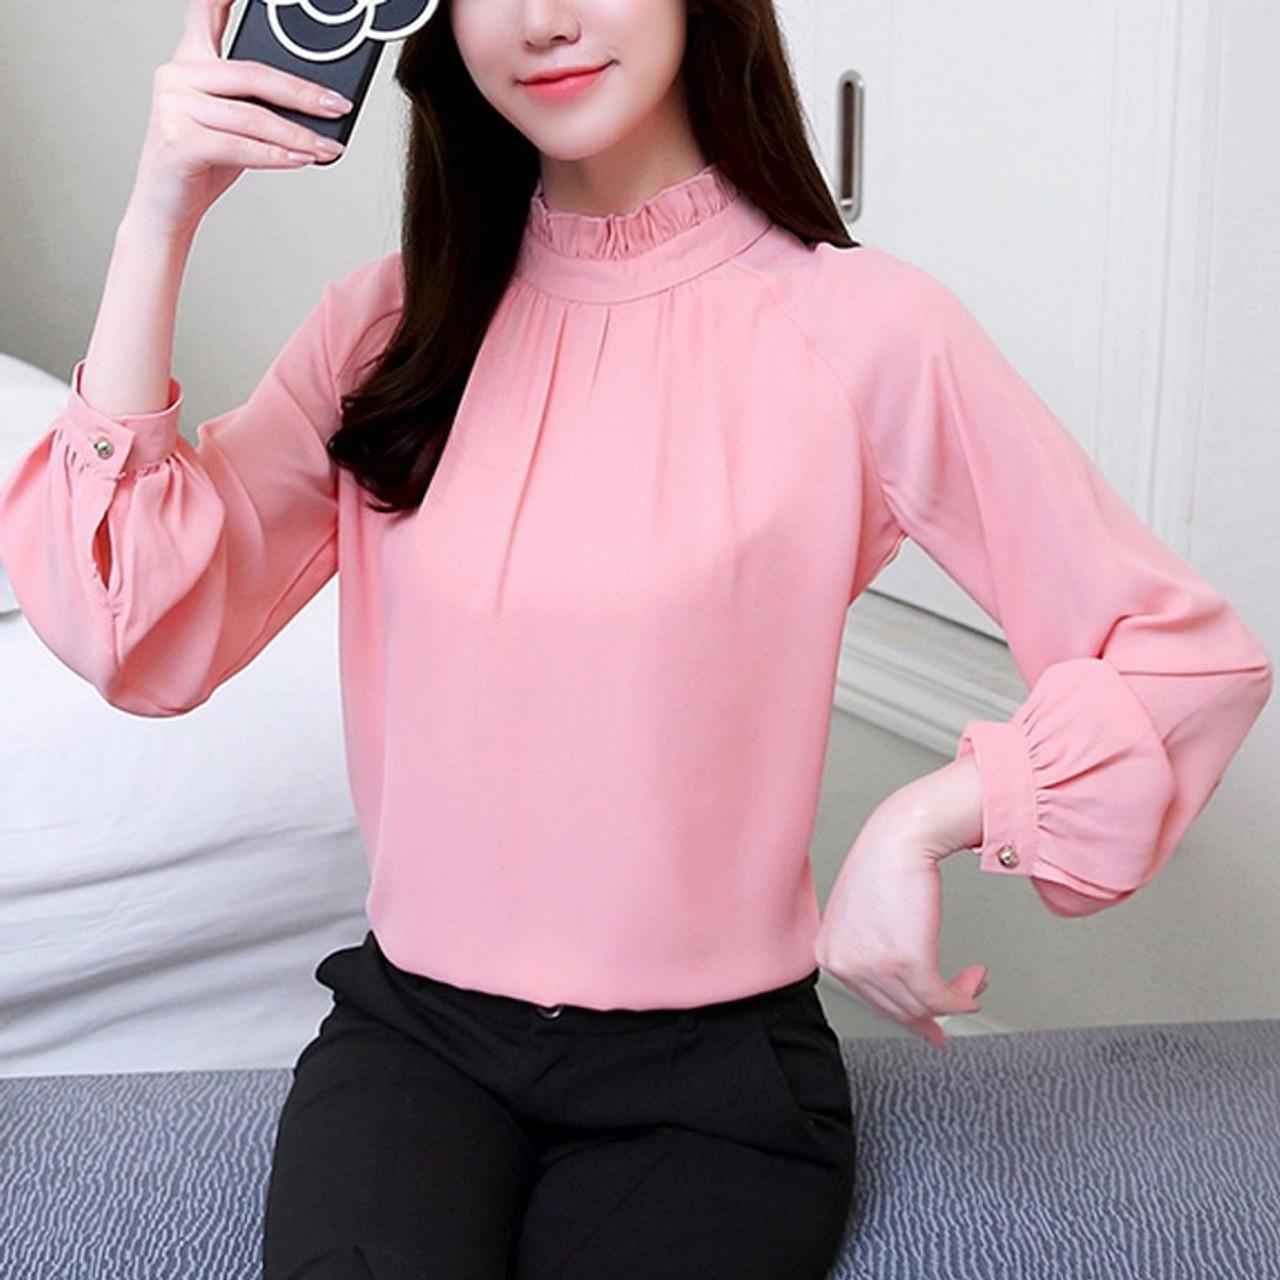 4295faba0 ... 2018 Spring Blusas Feminina Elegant Chiffon Blouses Women Casual Lantern  Sleeve Female Shirt Fashion Pink Purple ...